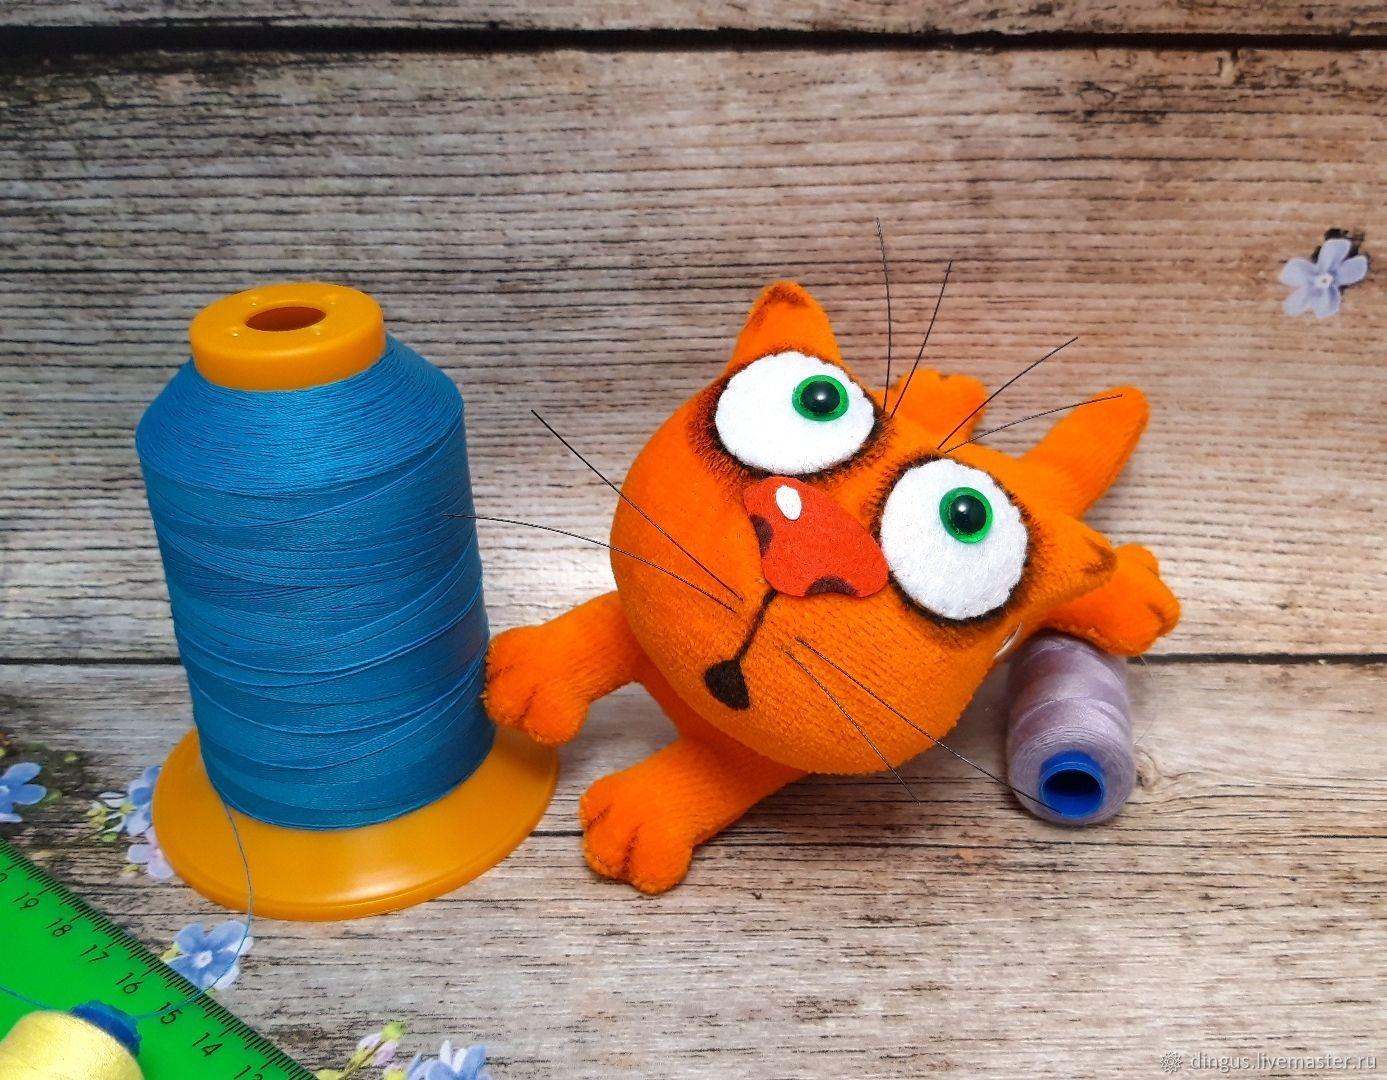 Keychain orange cat Babaika soft stuffed plush toy for cat lovers, Stuffed Toys, Moscow,  Фото №1